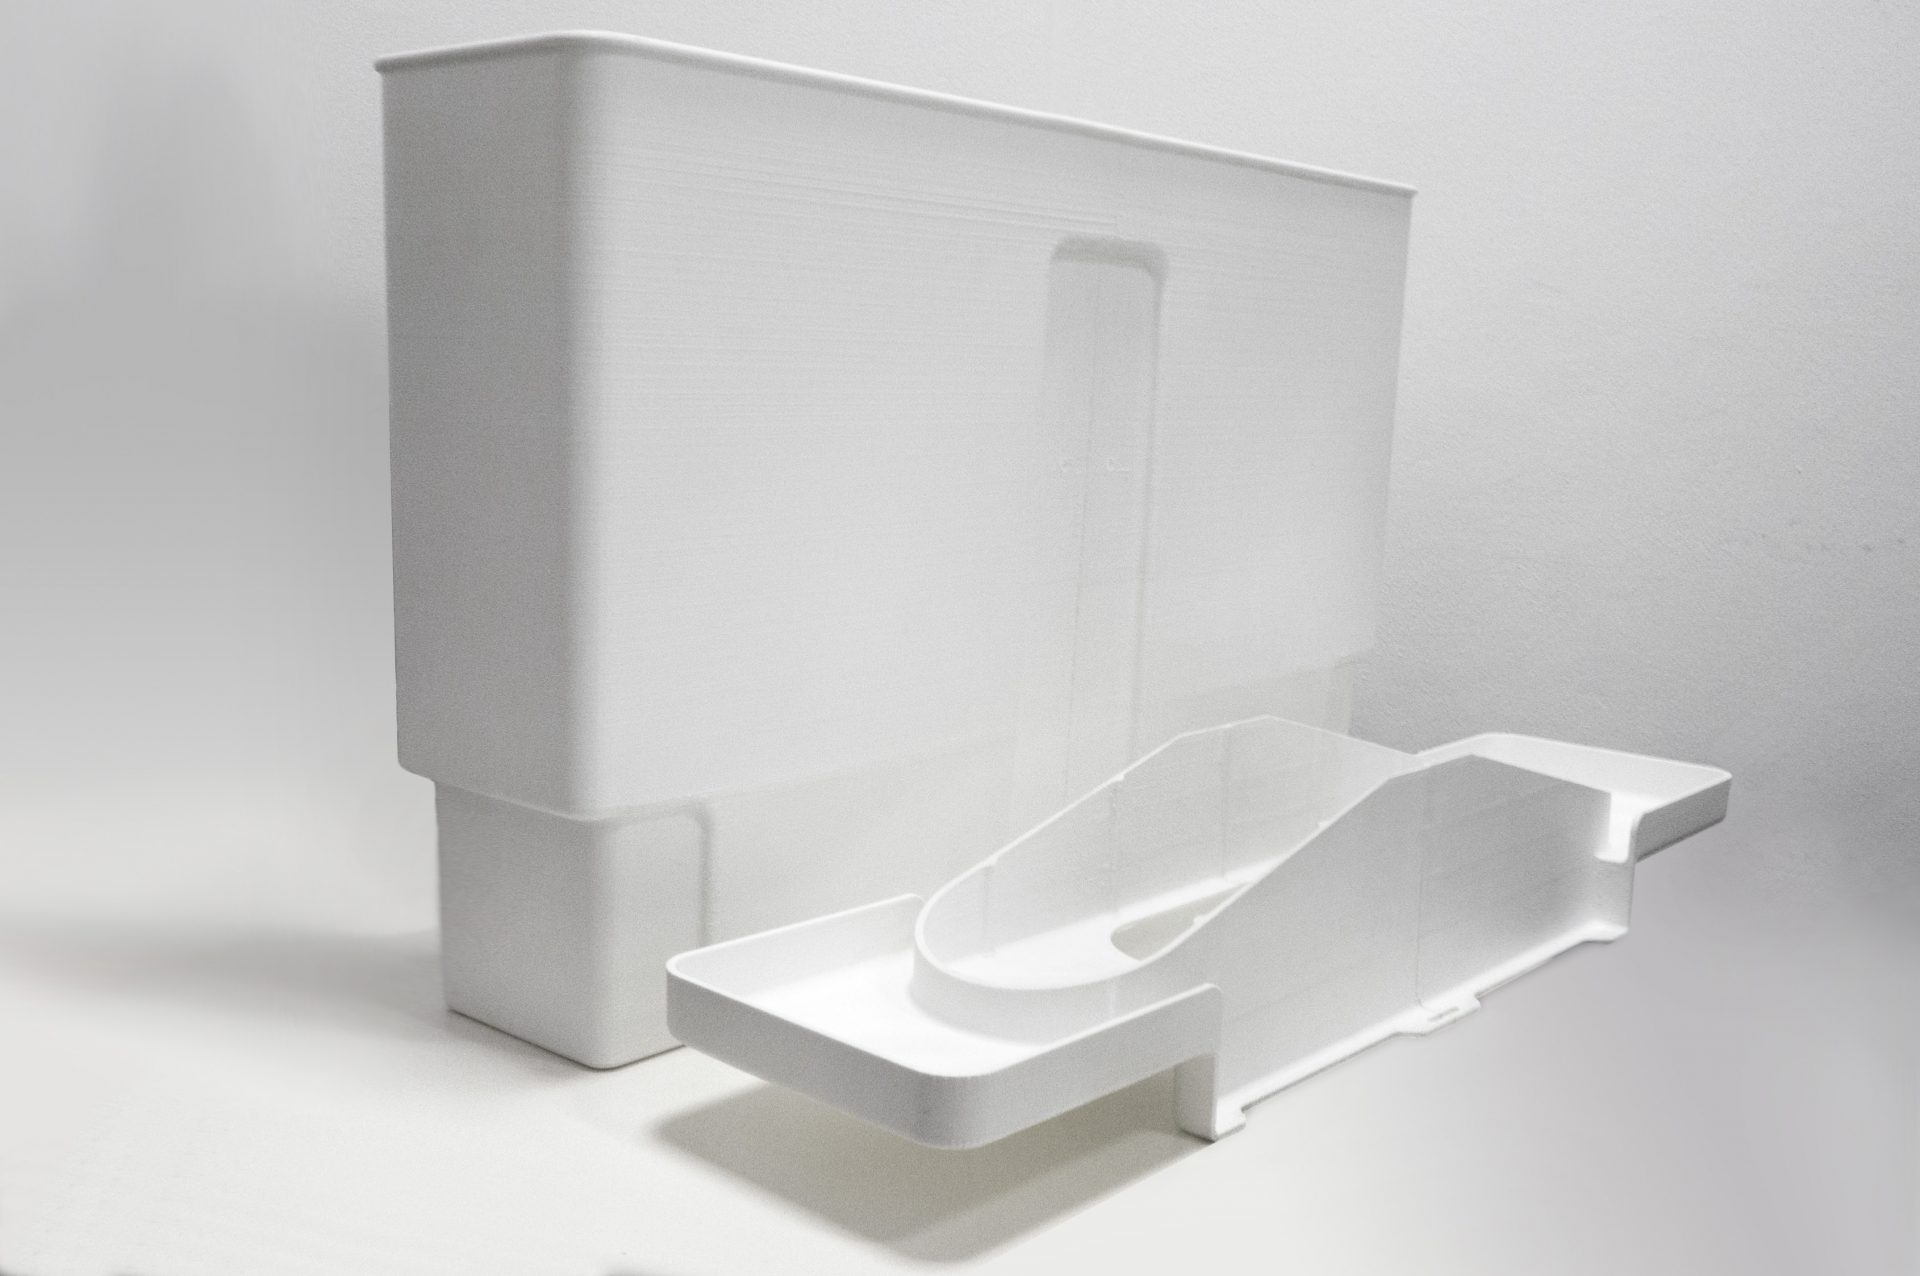 prepravny box prototyp